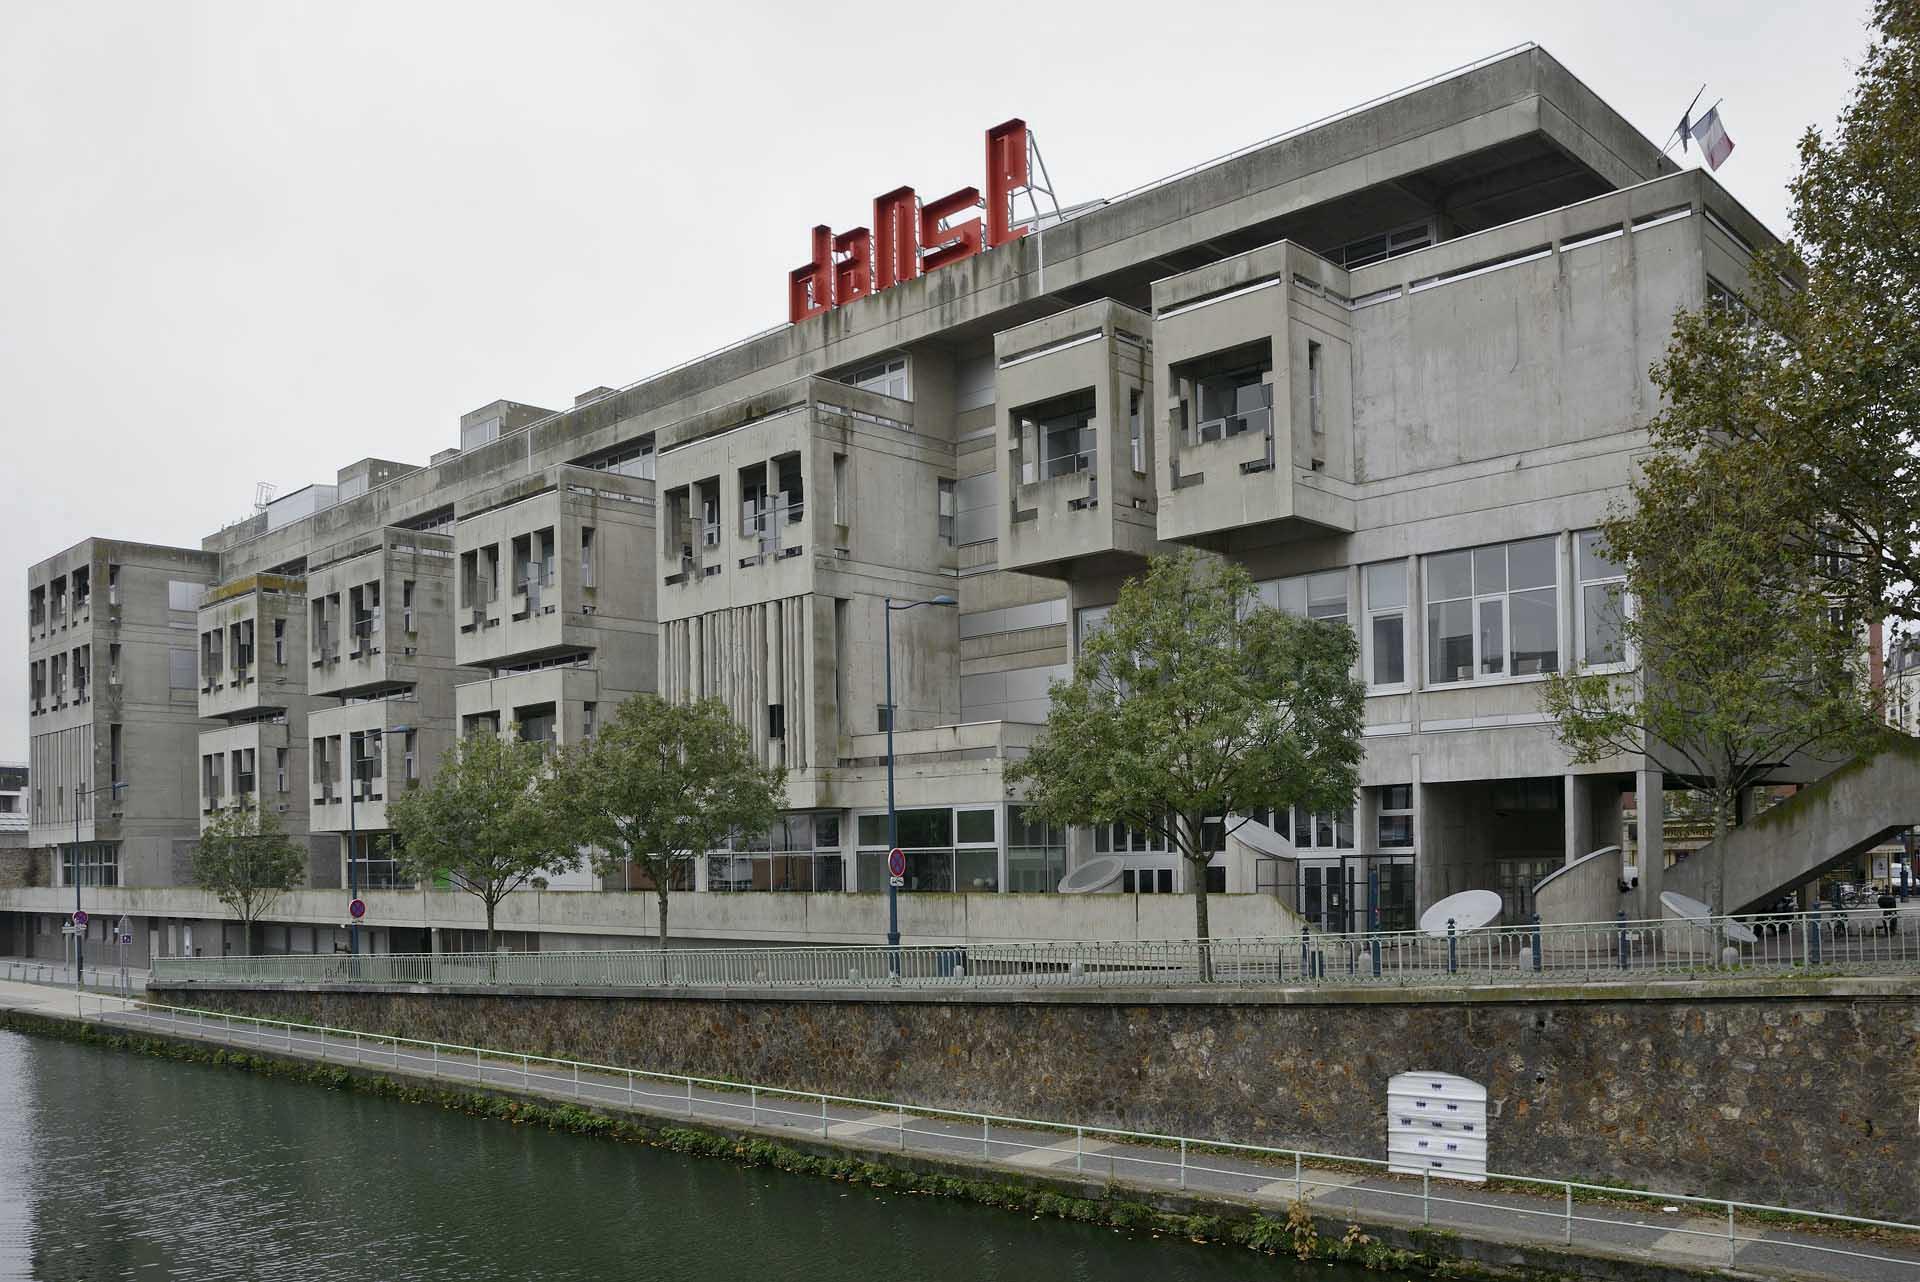 Administrative Centre of Pantin - Jaques Kalisz, Jean Perrottet, 1964-73